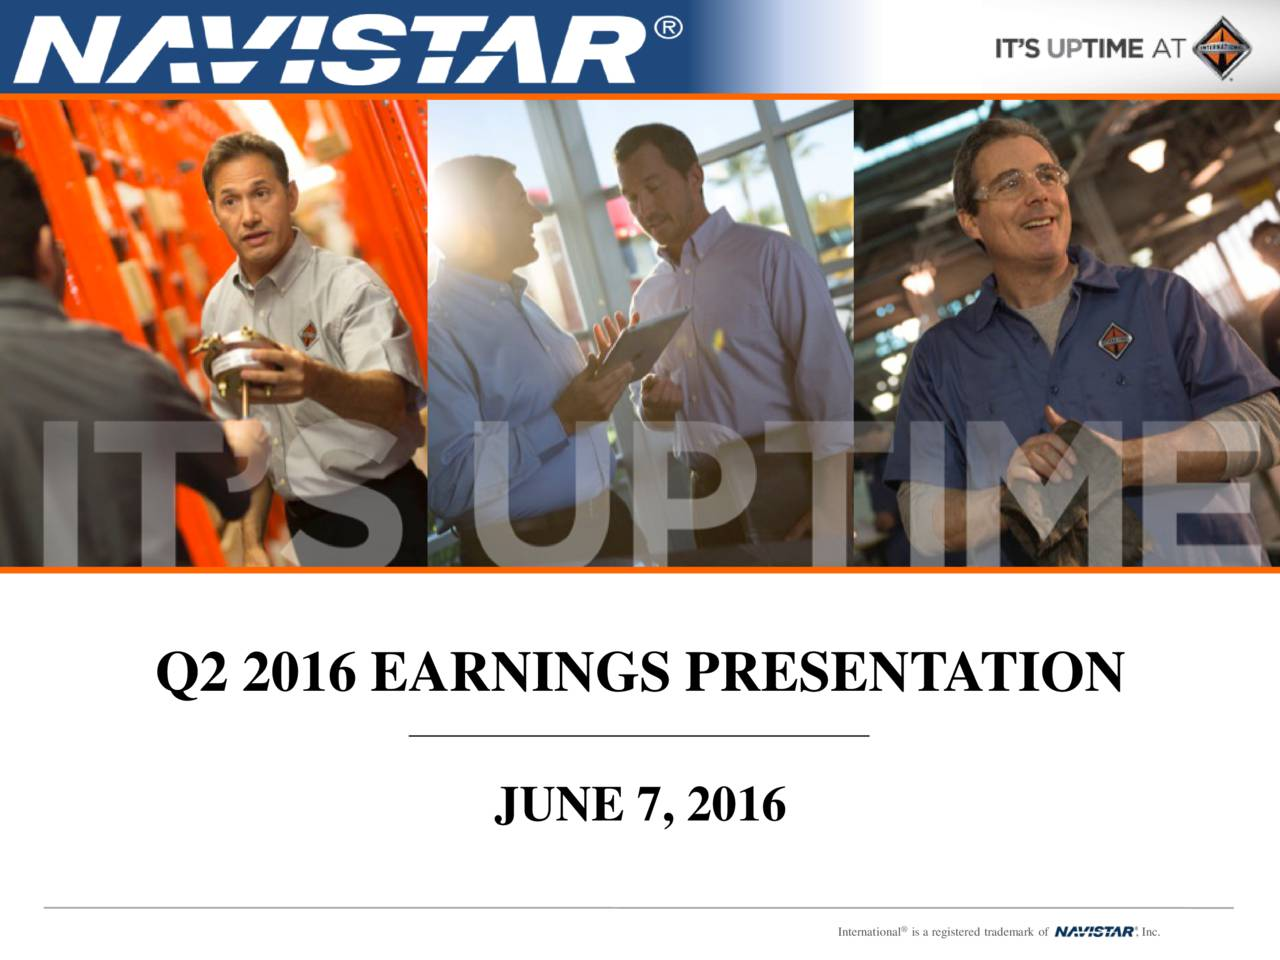 JUNE 7, 2016 NYSE: NAV International is a registe, Inc.a1emark of